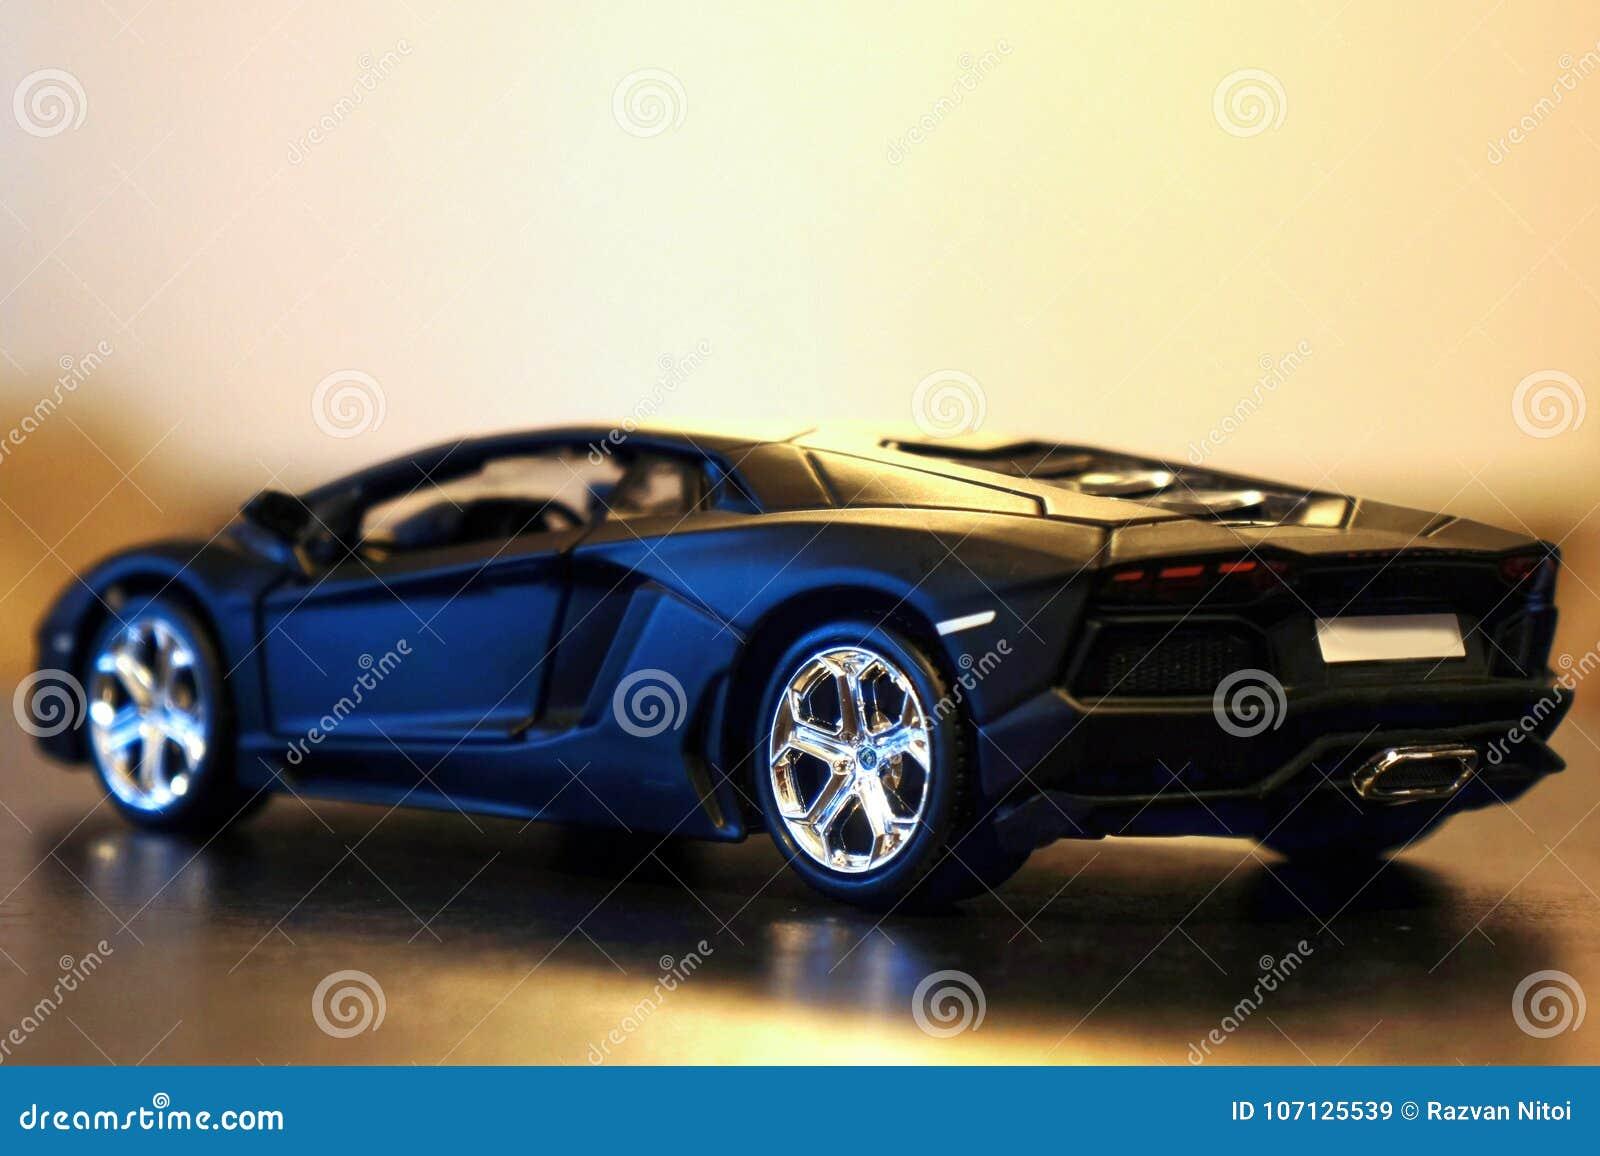 Lamborghini Aventador lp700-4 modelautozijde/achtergedeelte